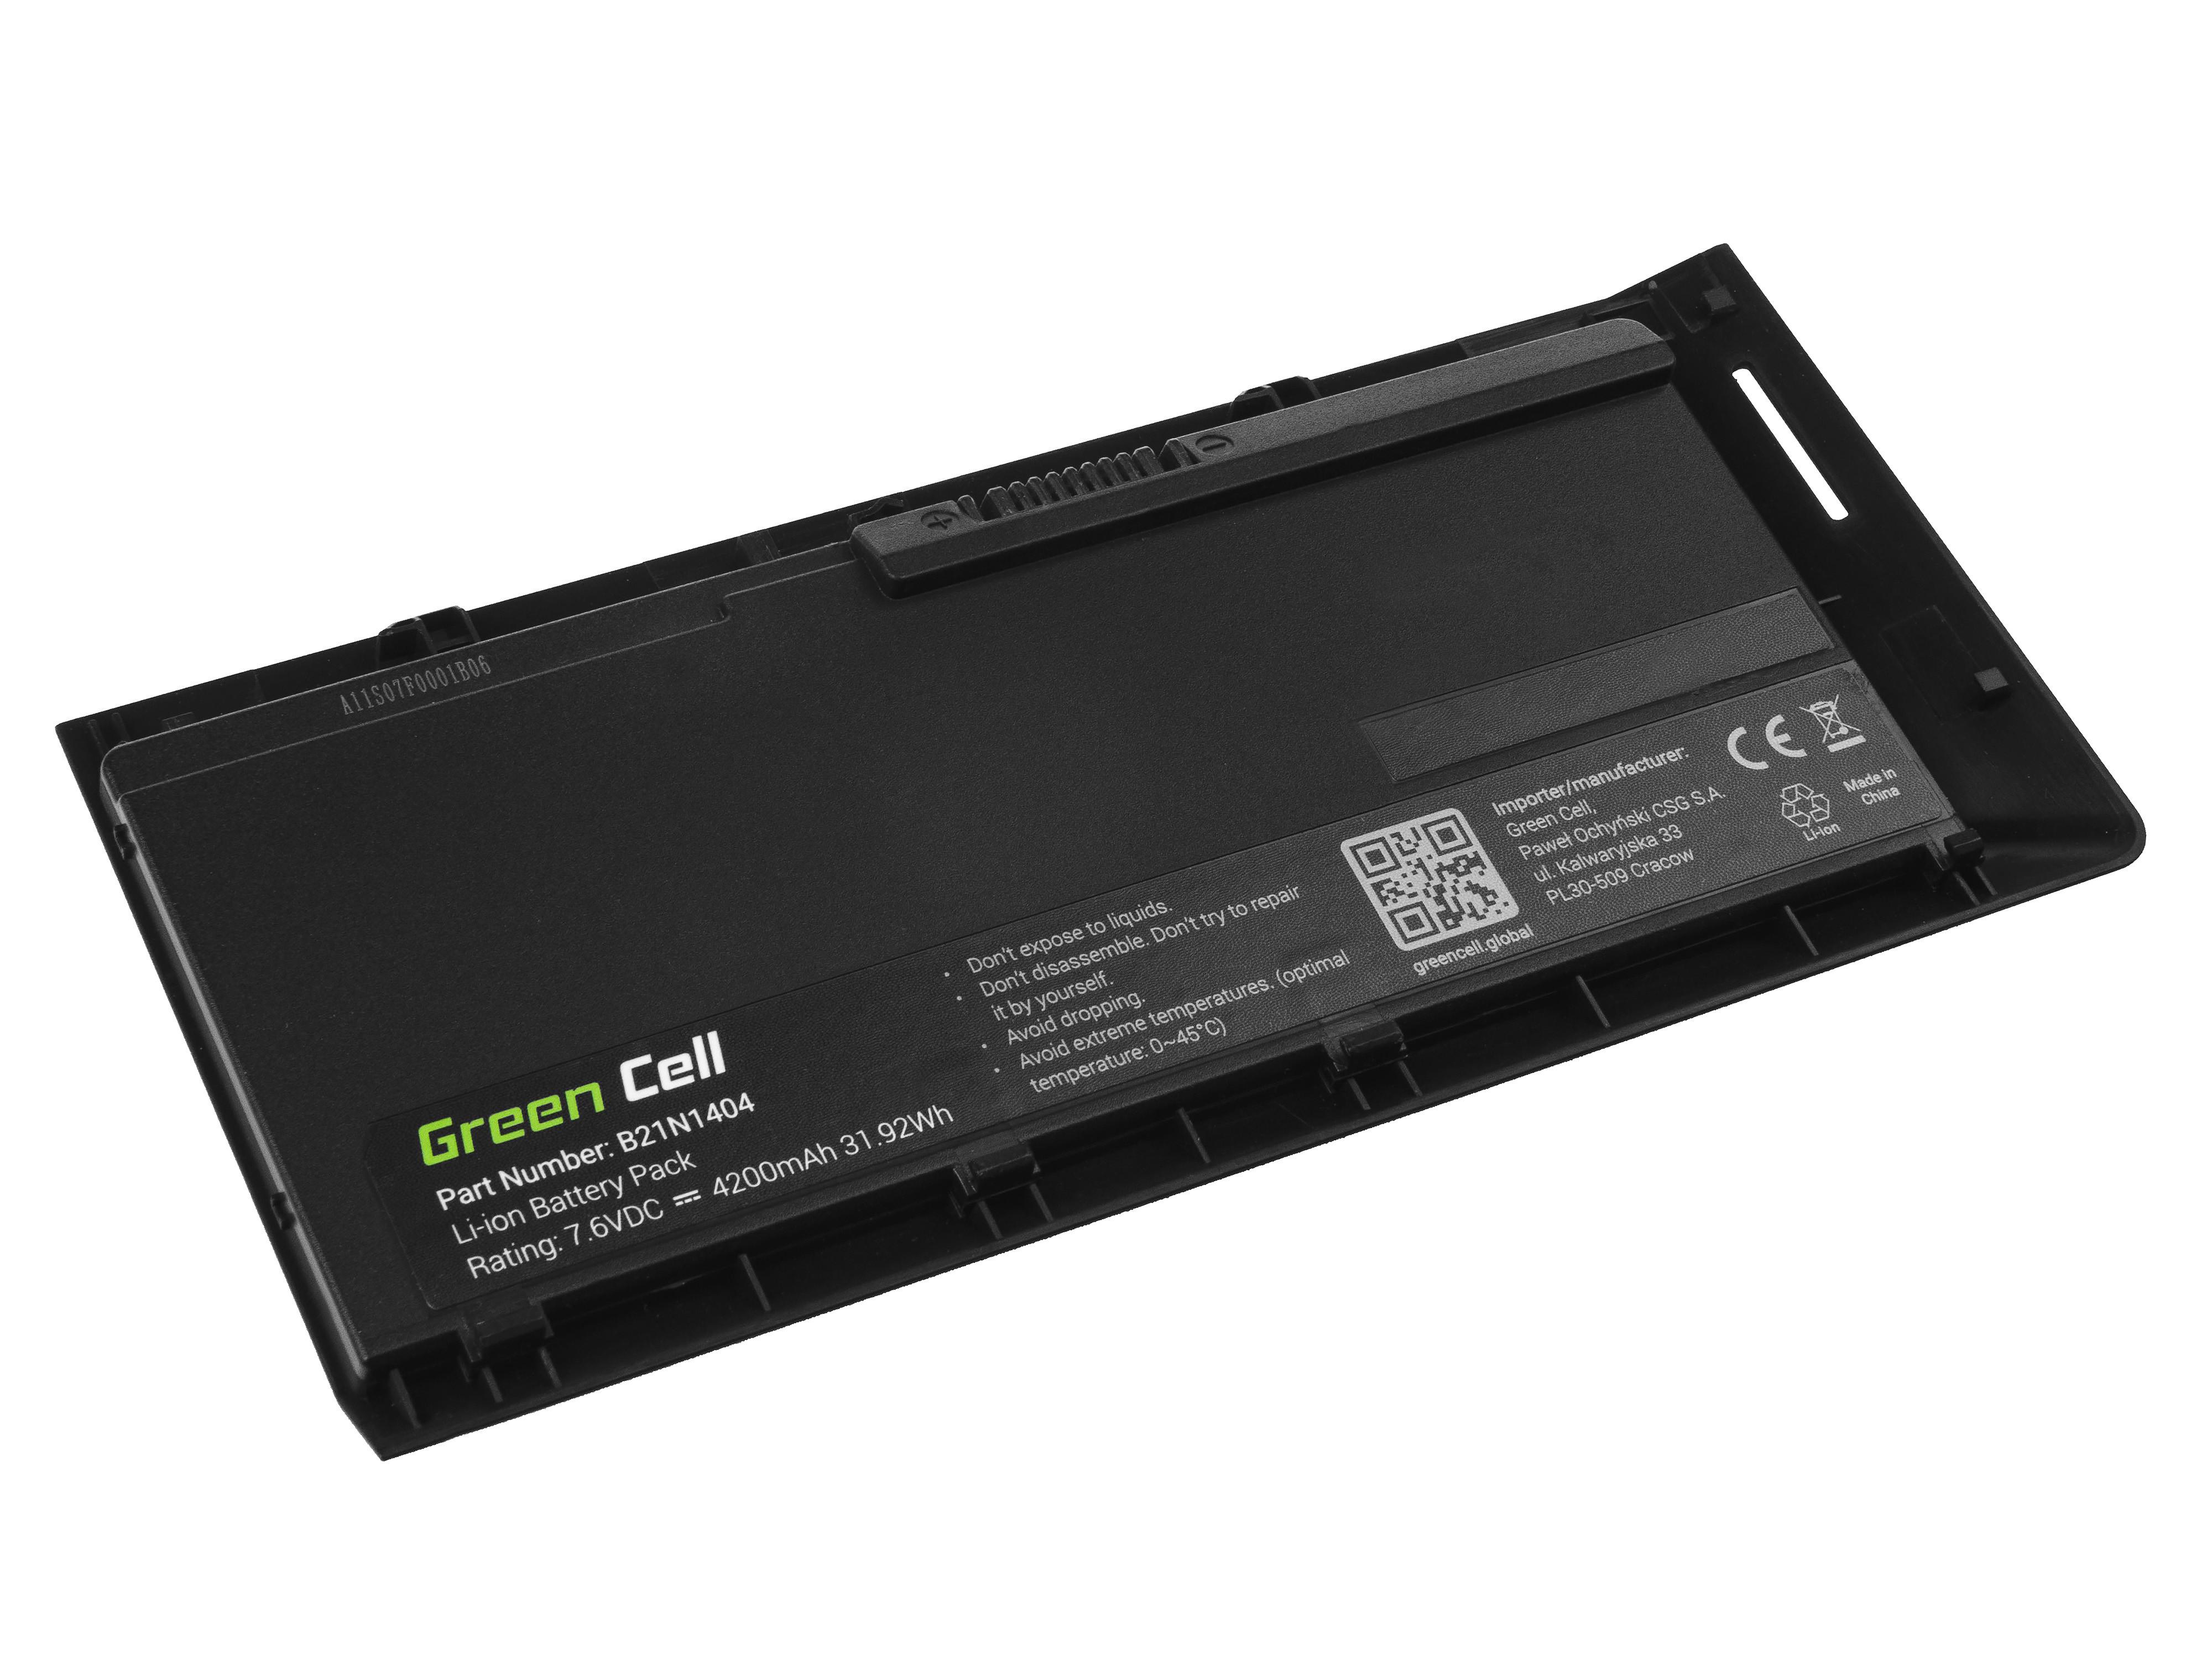 Green Cell Baterie B21N1404 do Asus AsusPRO BU201 BU201L BU201LA